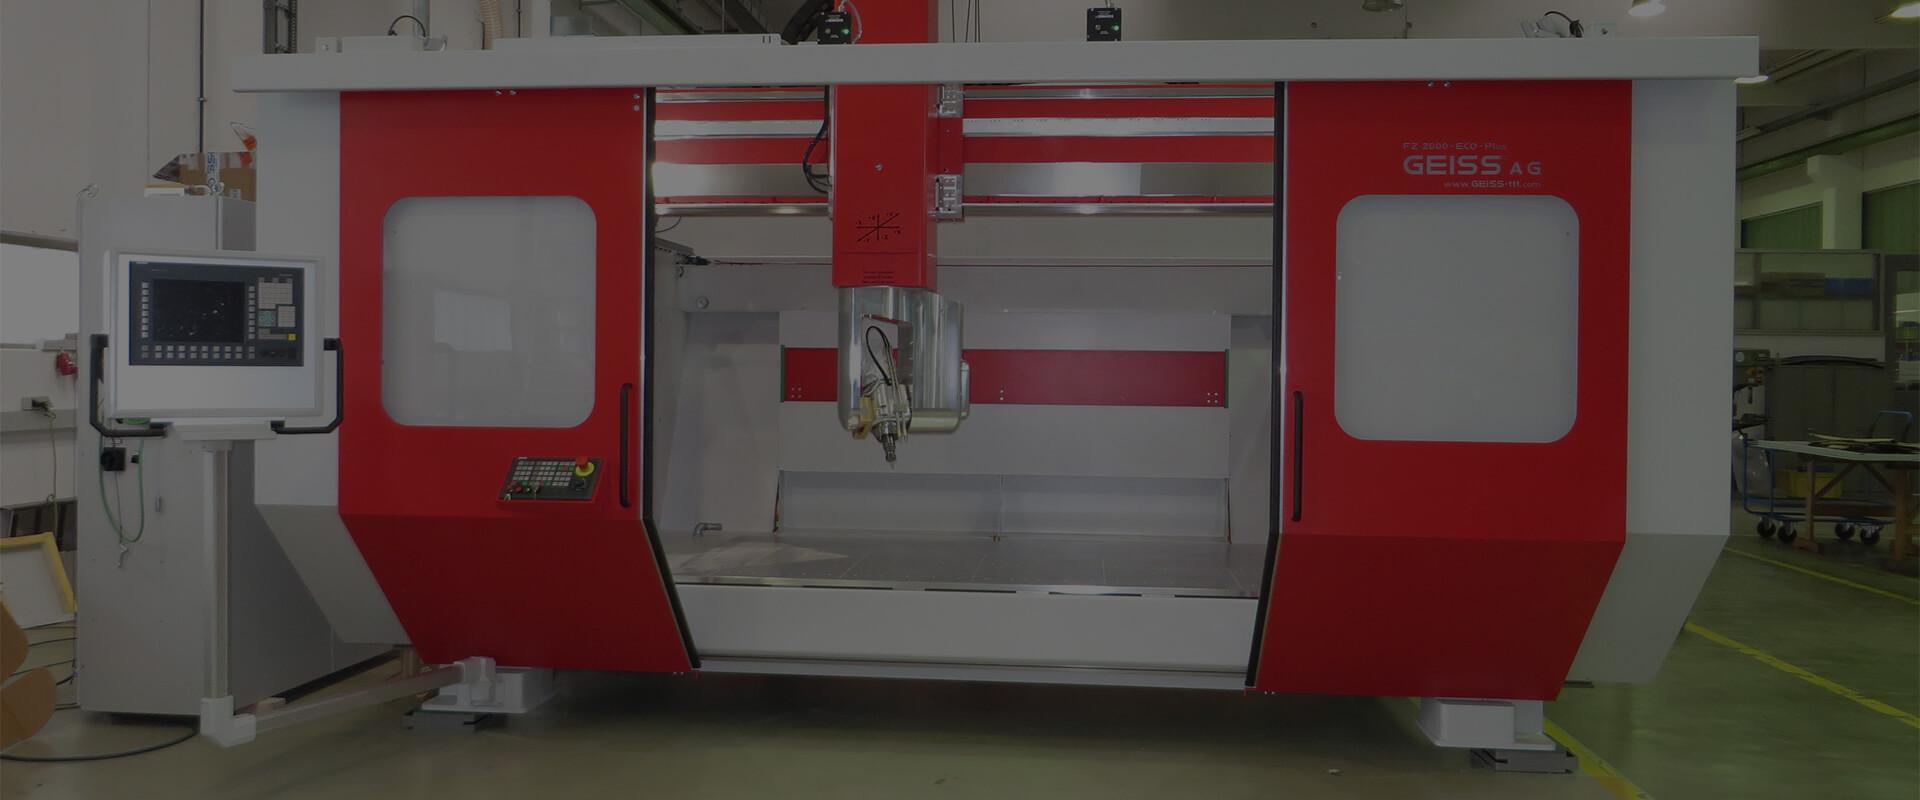 CNC Fräsmaschine